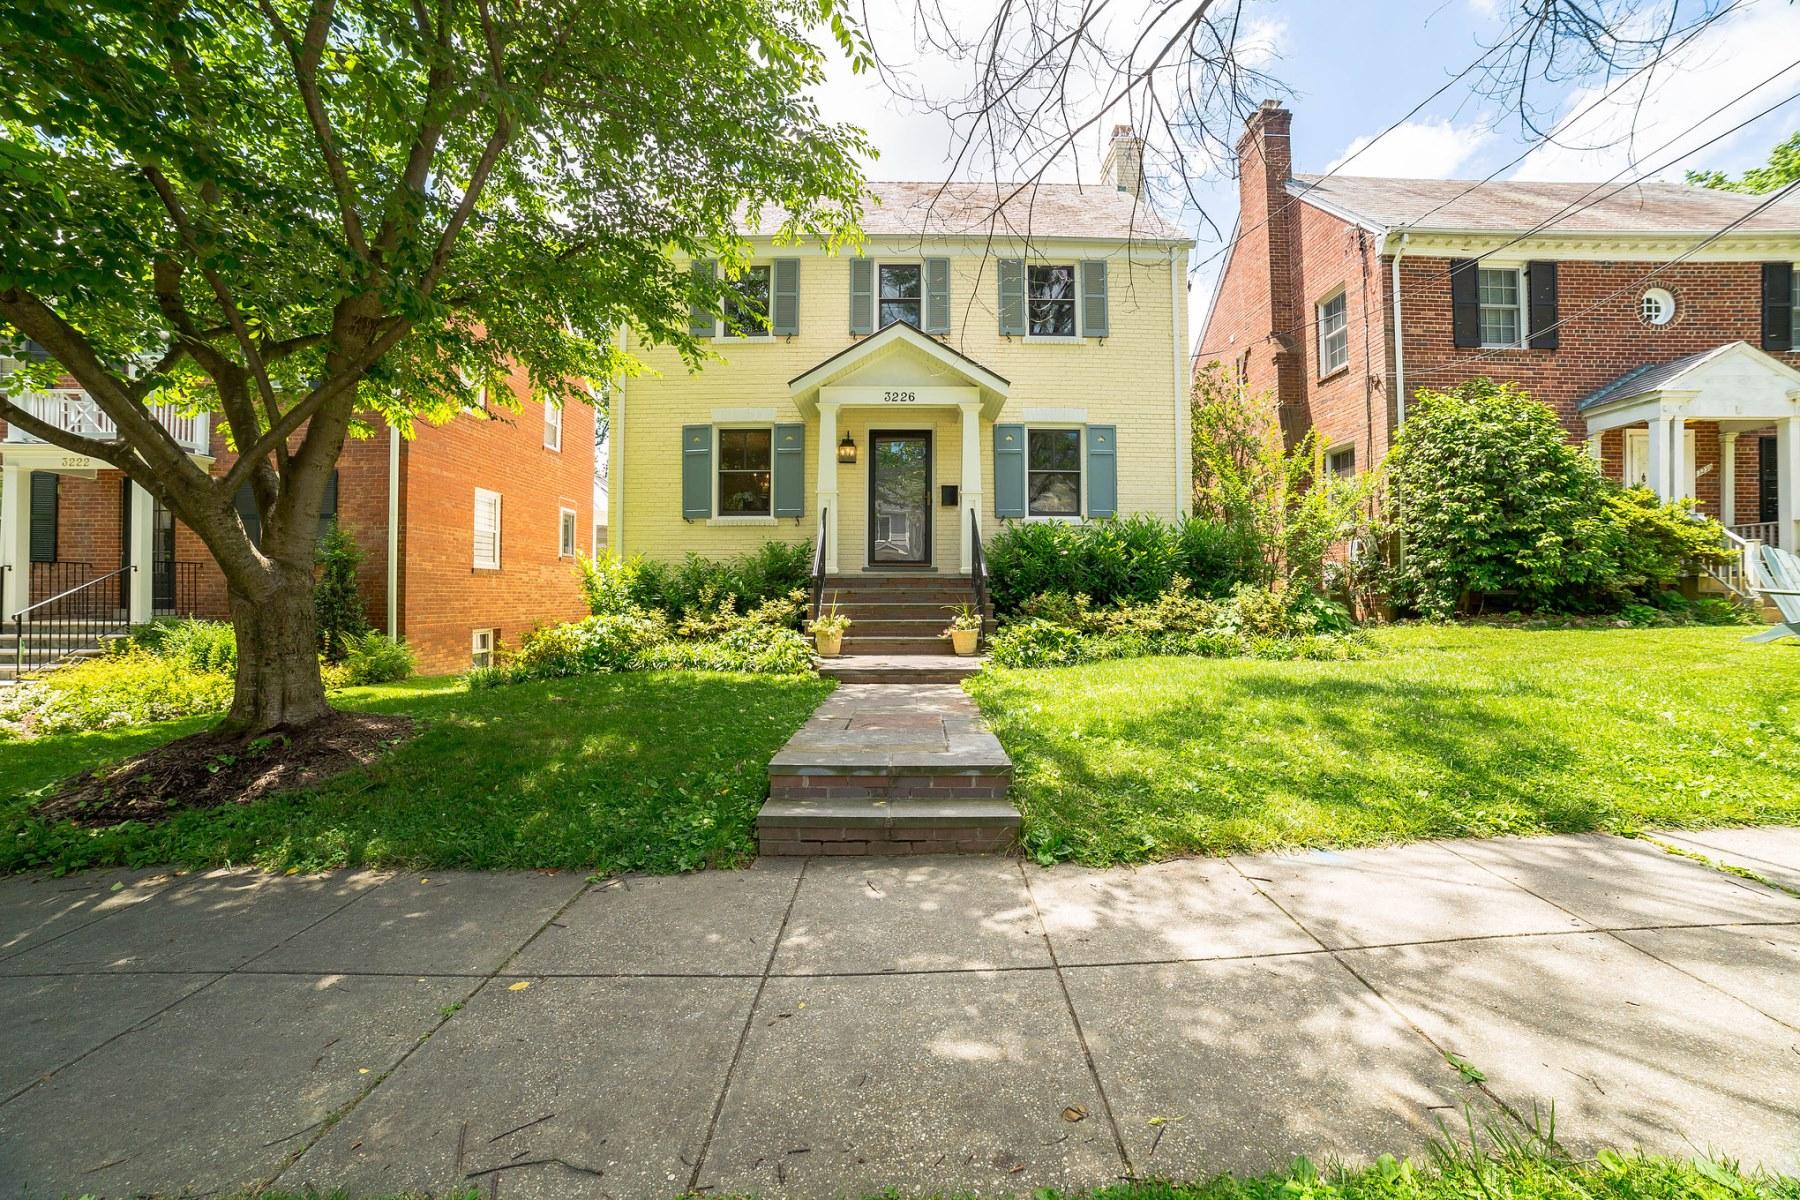 Single Family Home for Rent at 3226 Quesada Street Nw, Washington Washington, District Of Columbia 20015 United States